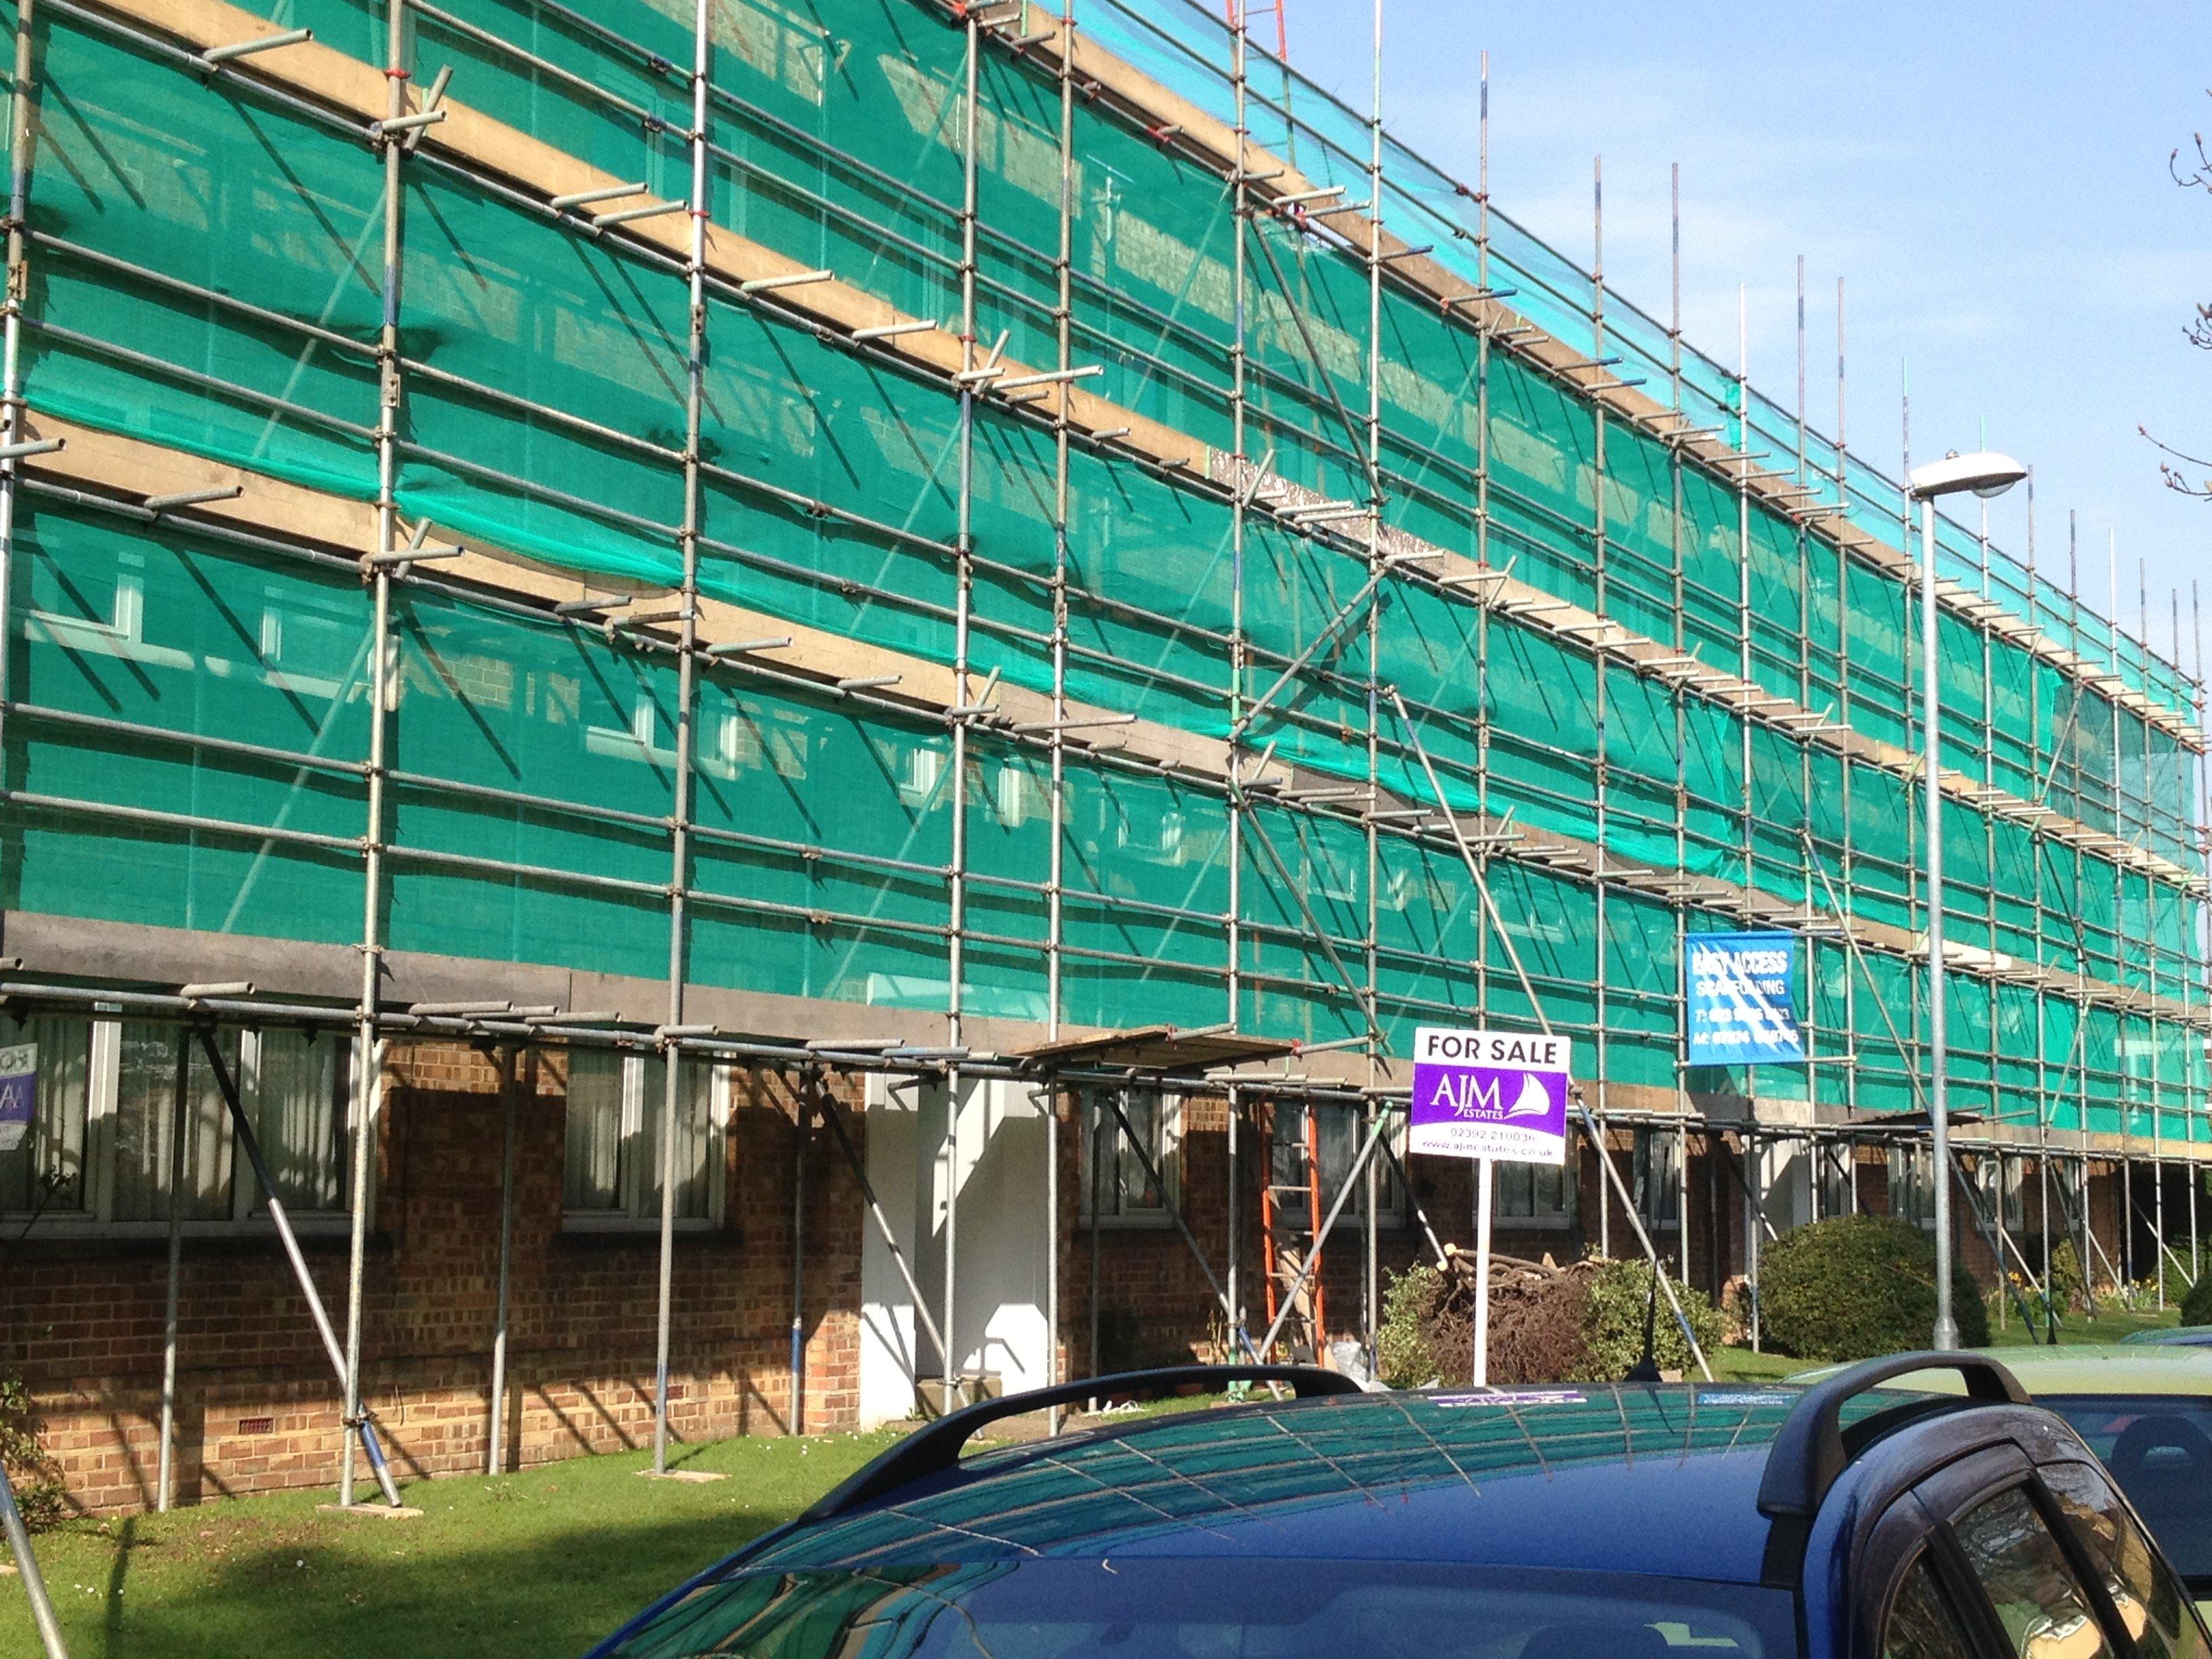 building work